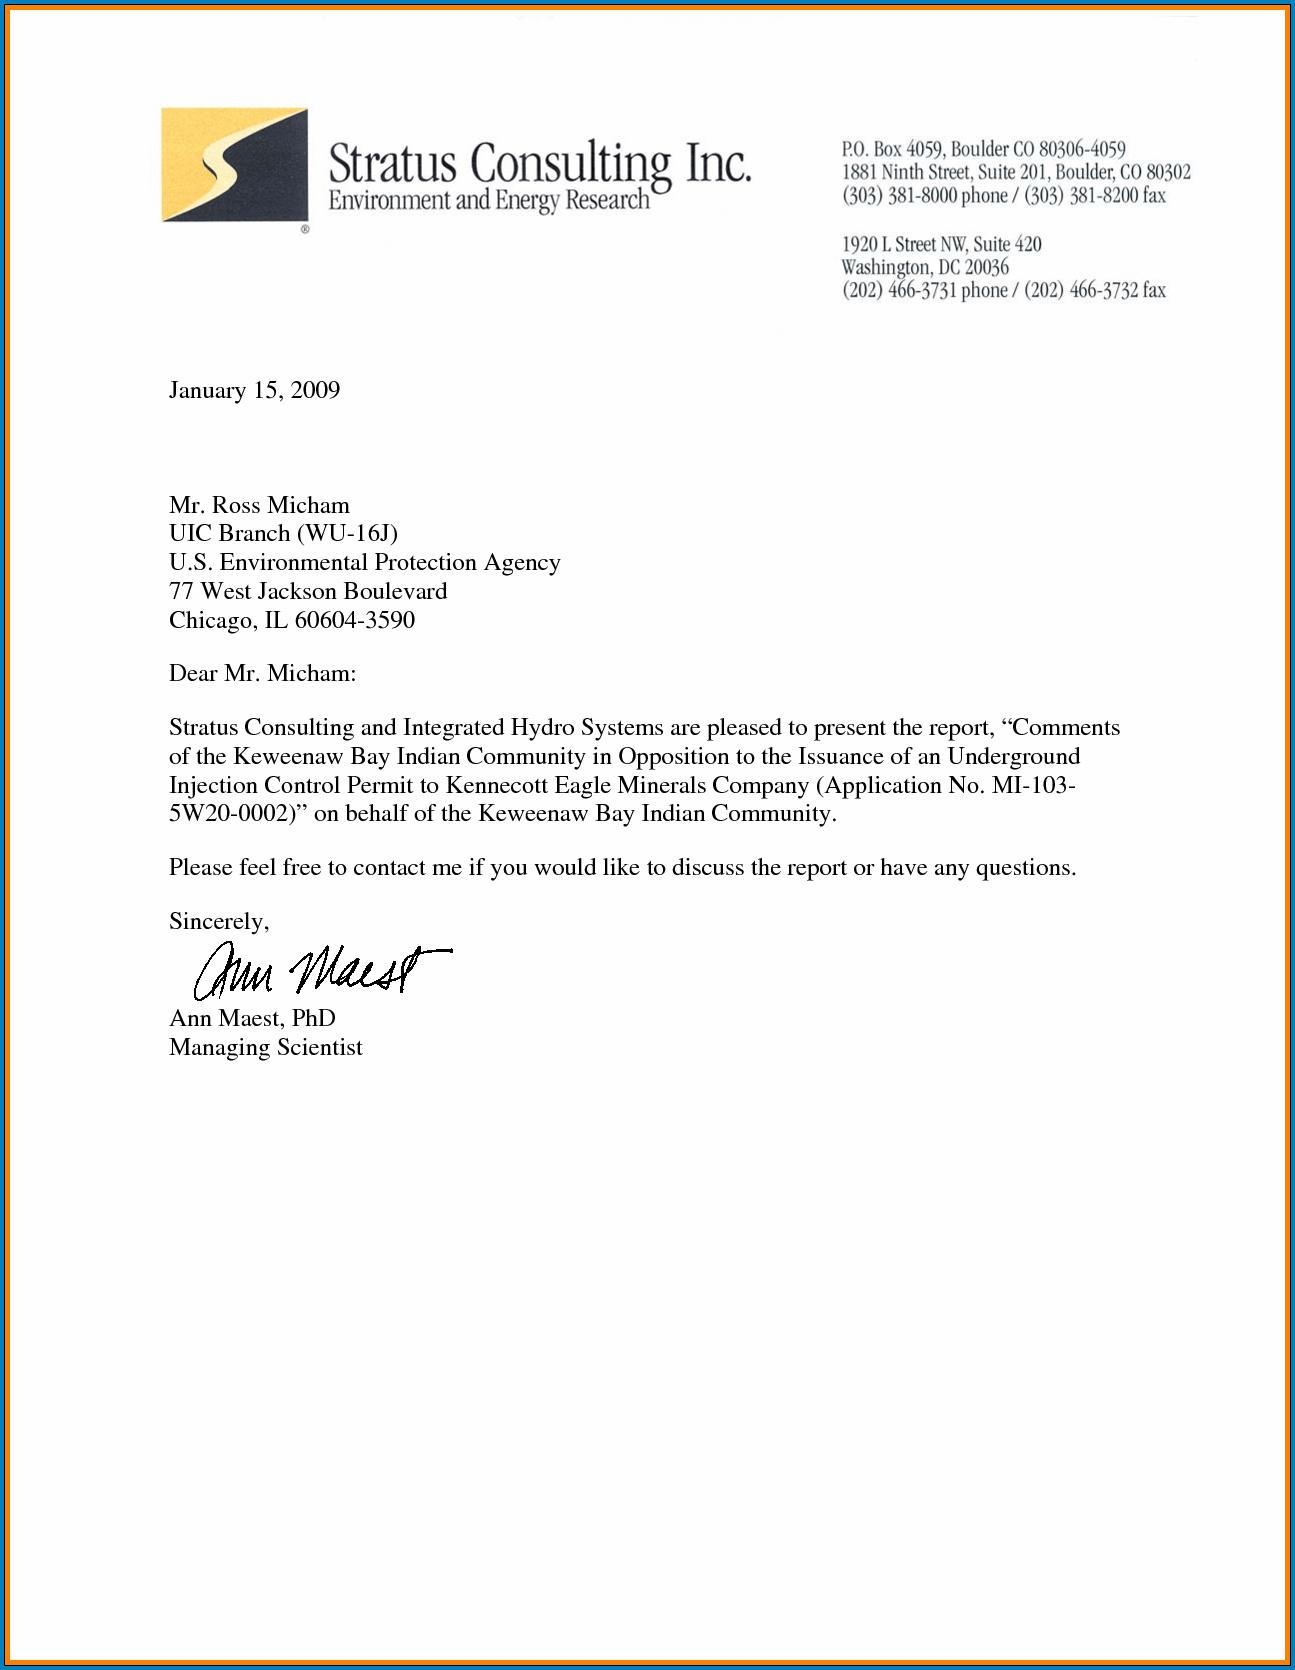 Business Letterhead Template Sample